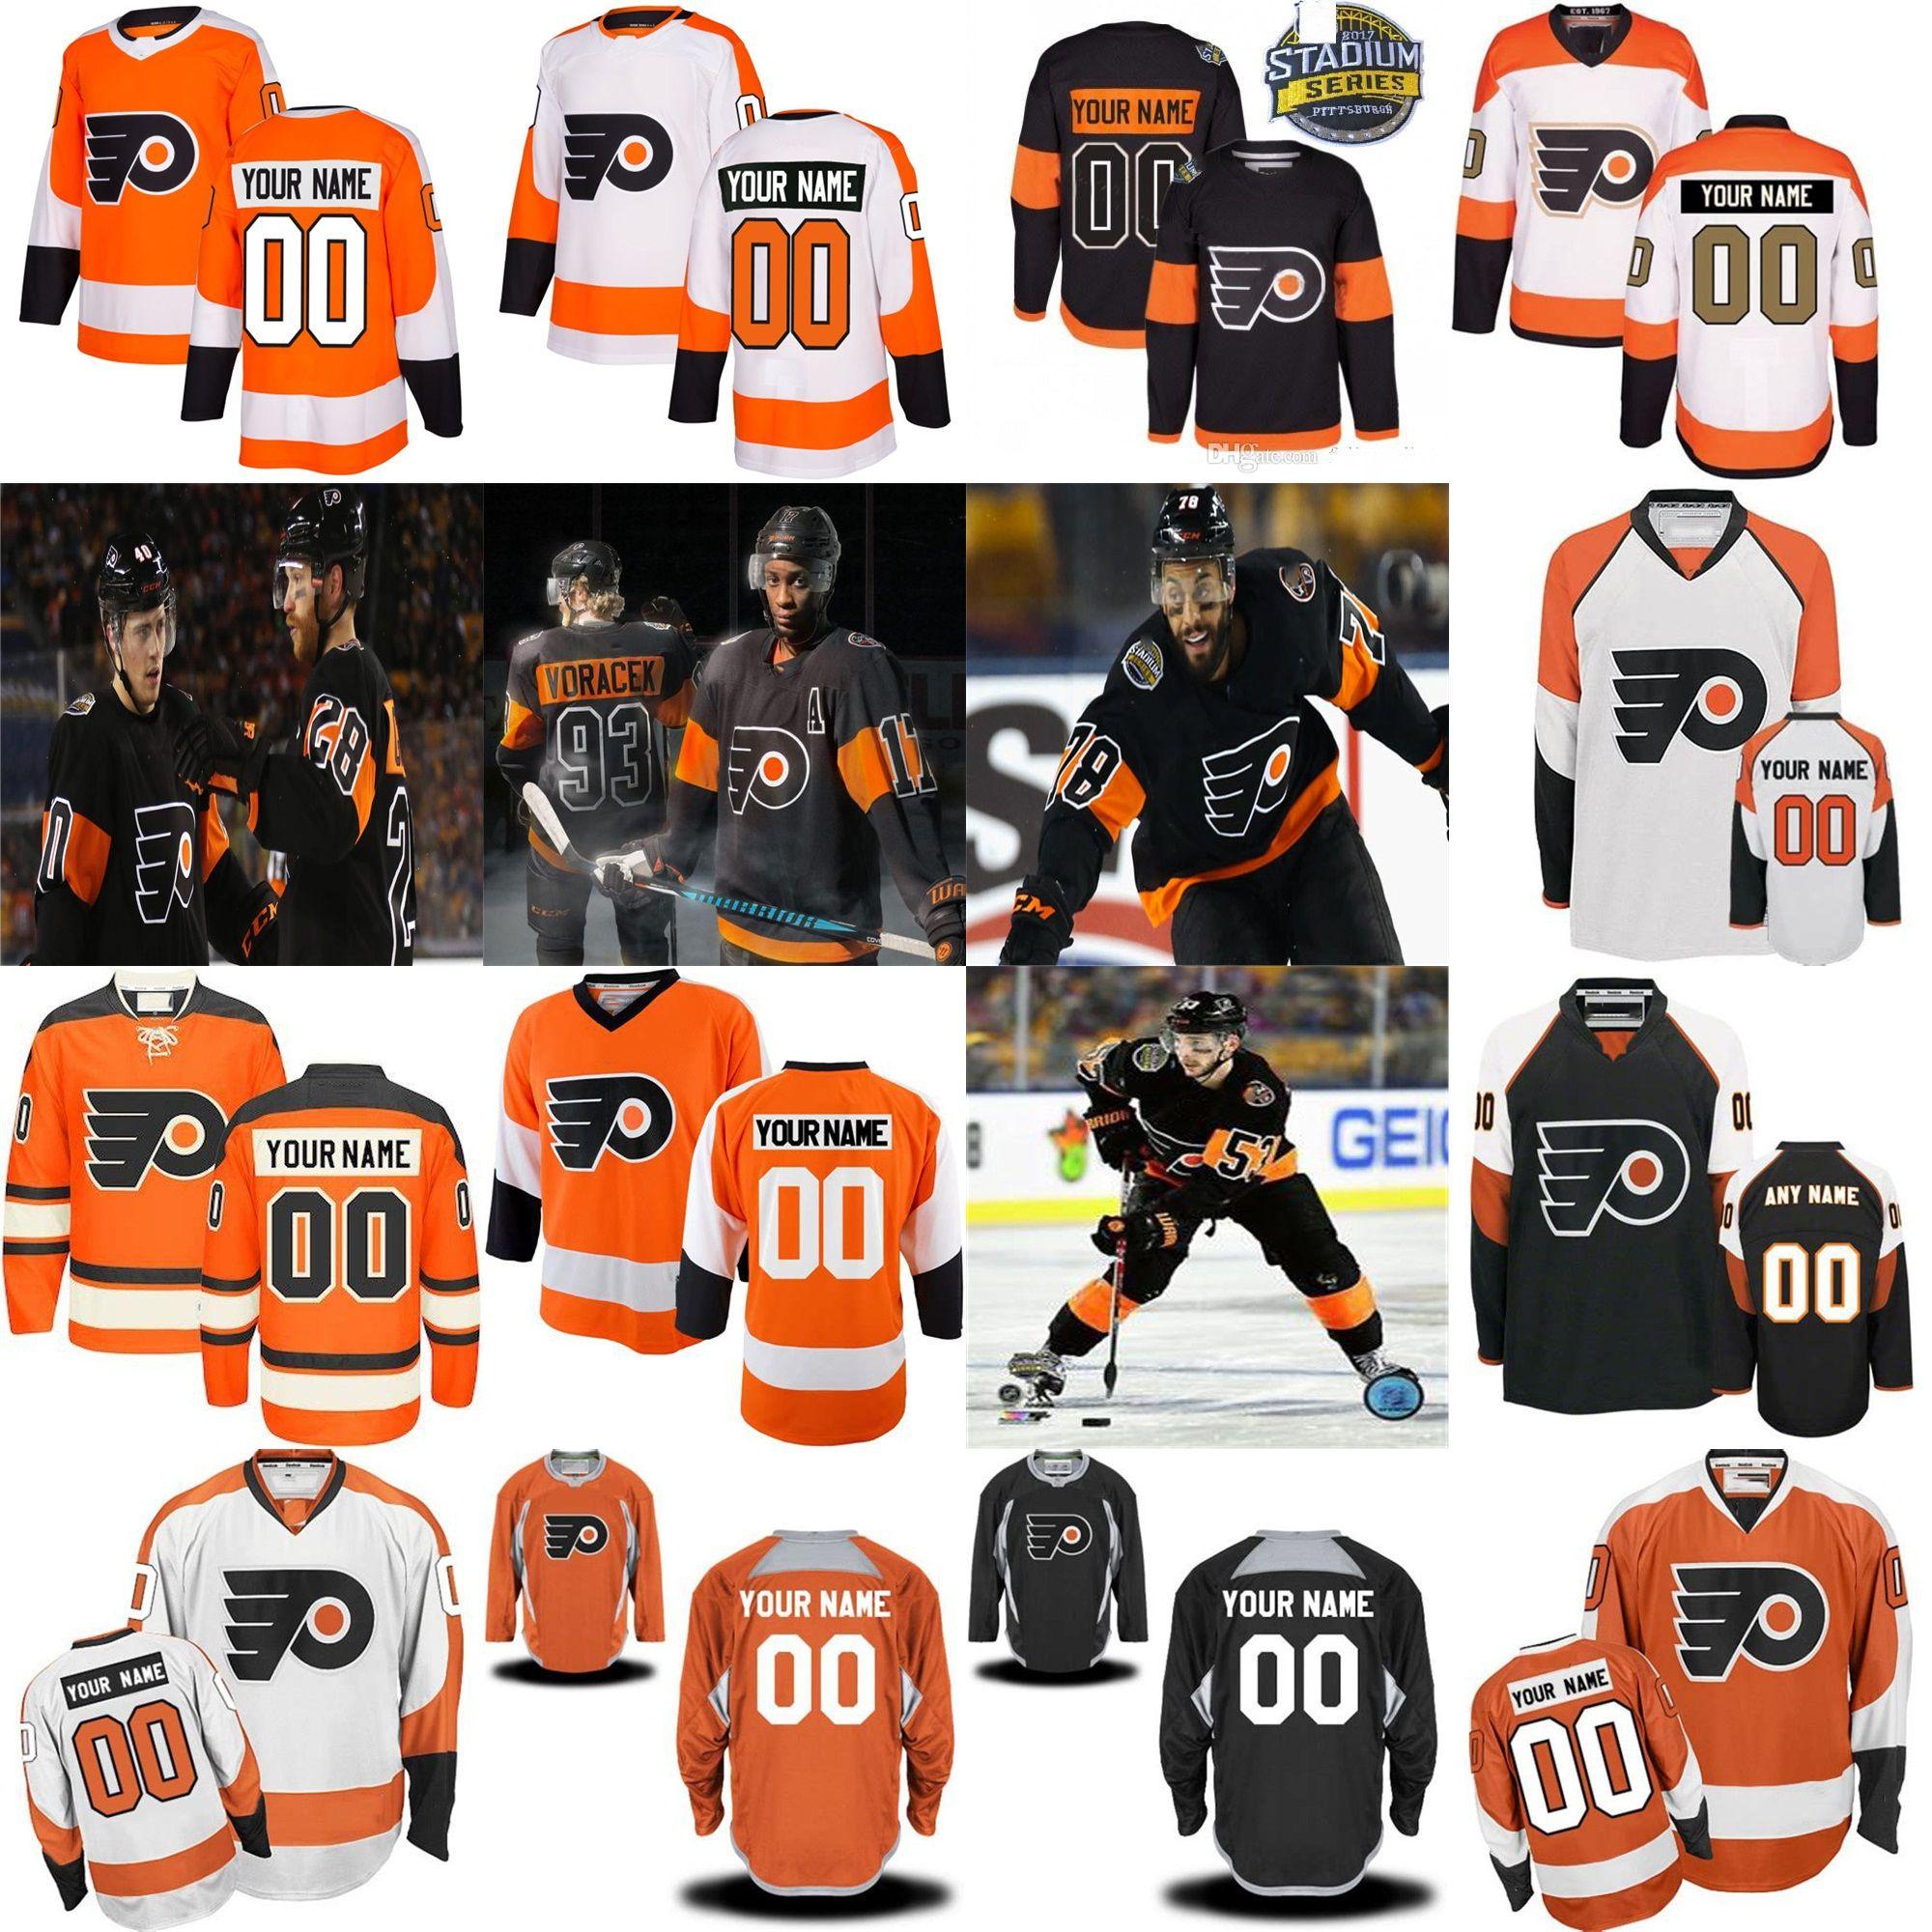 da5db3719 2019 Philadelphia Flyers 53 Shayne Gostisbehere 2019 New Third Wayne  Simmonds Claude Giroux Jakub Voracek Provorov Konecny Custom Hockey Jersey  From Probowl ...